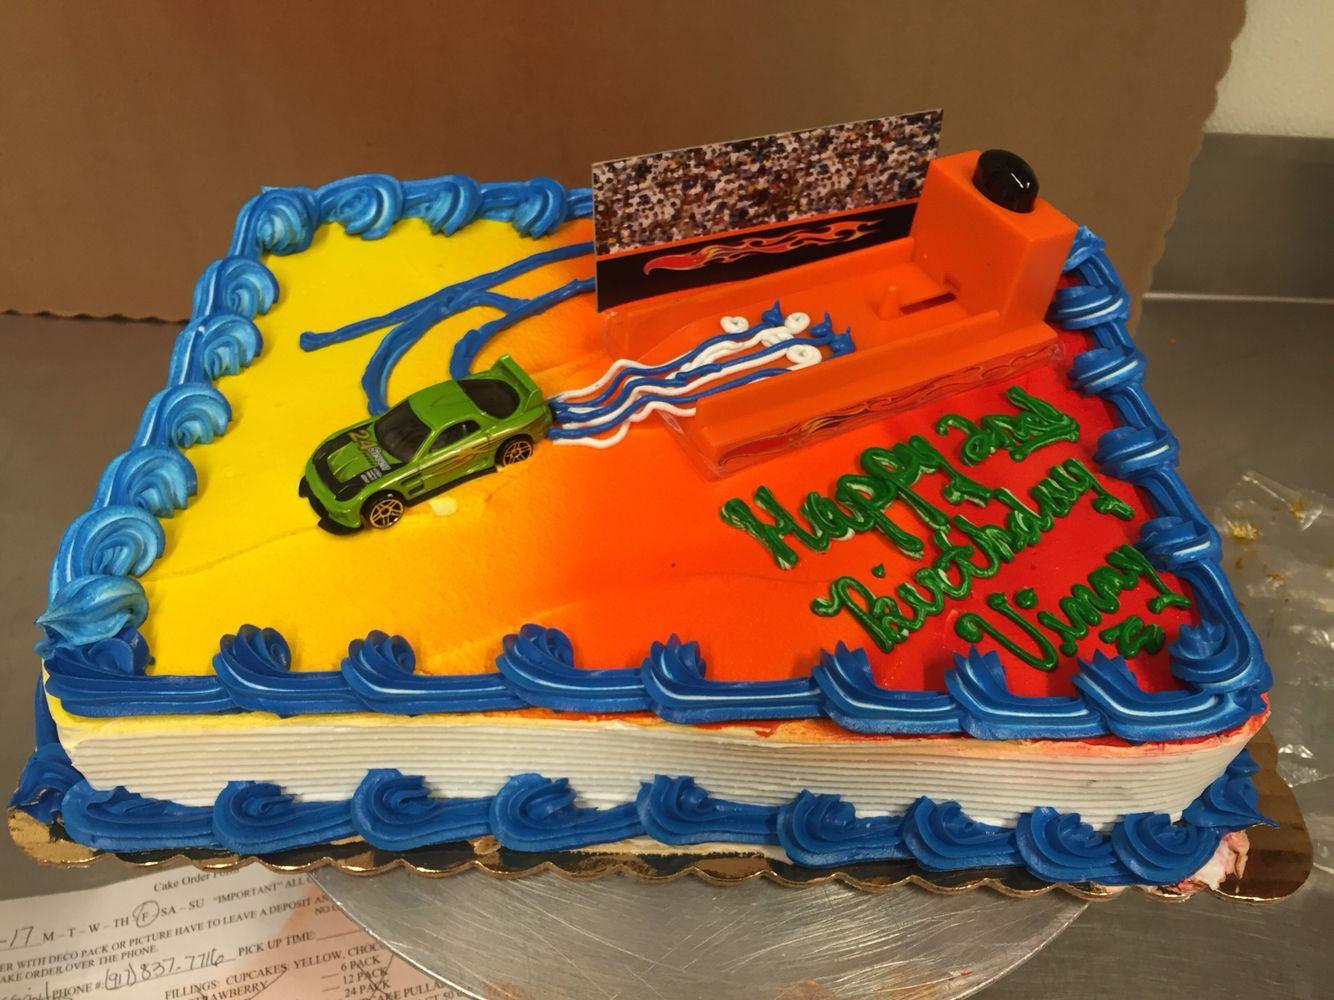 Hot Wheels Deco 1 4 Sheet Cake Ms Cake Boss Hot